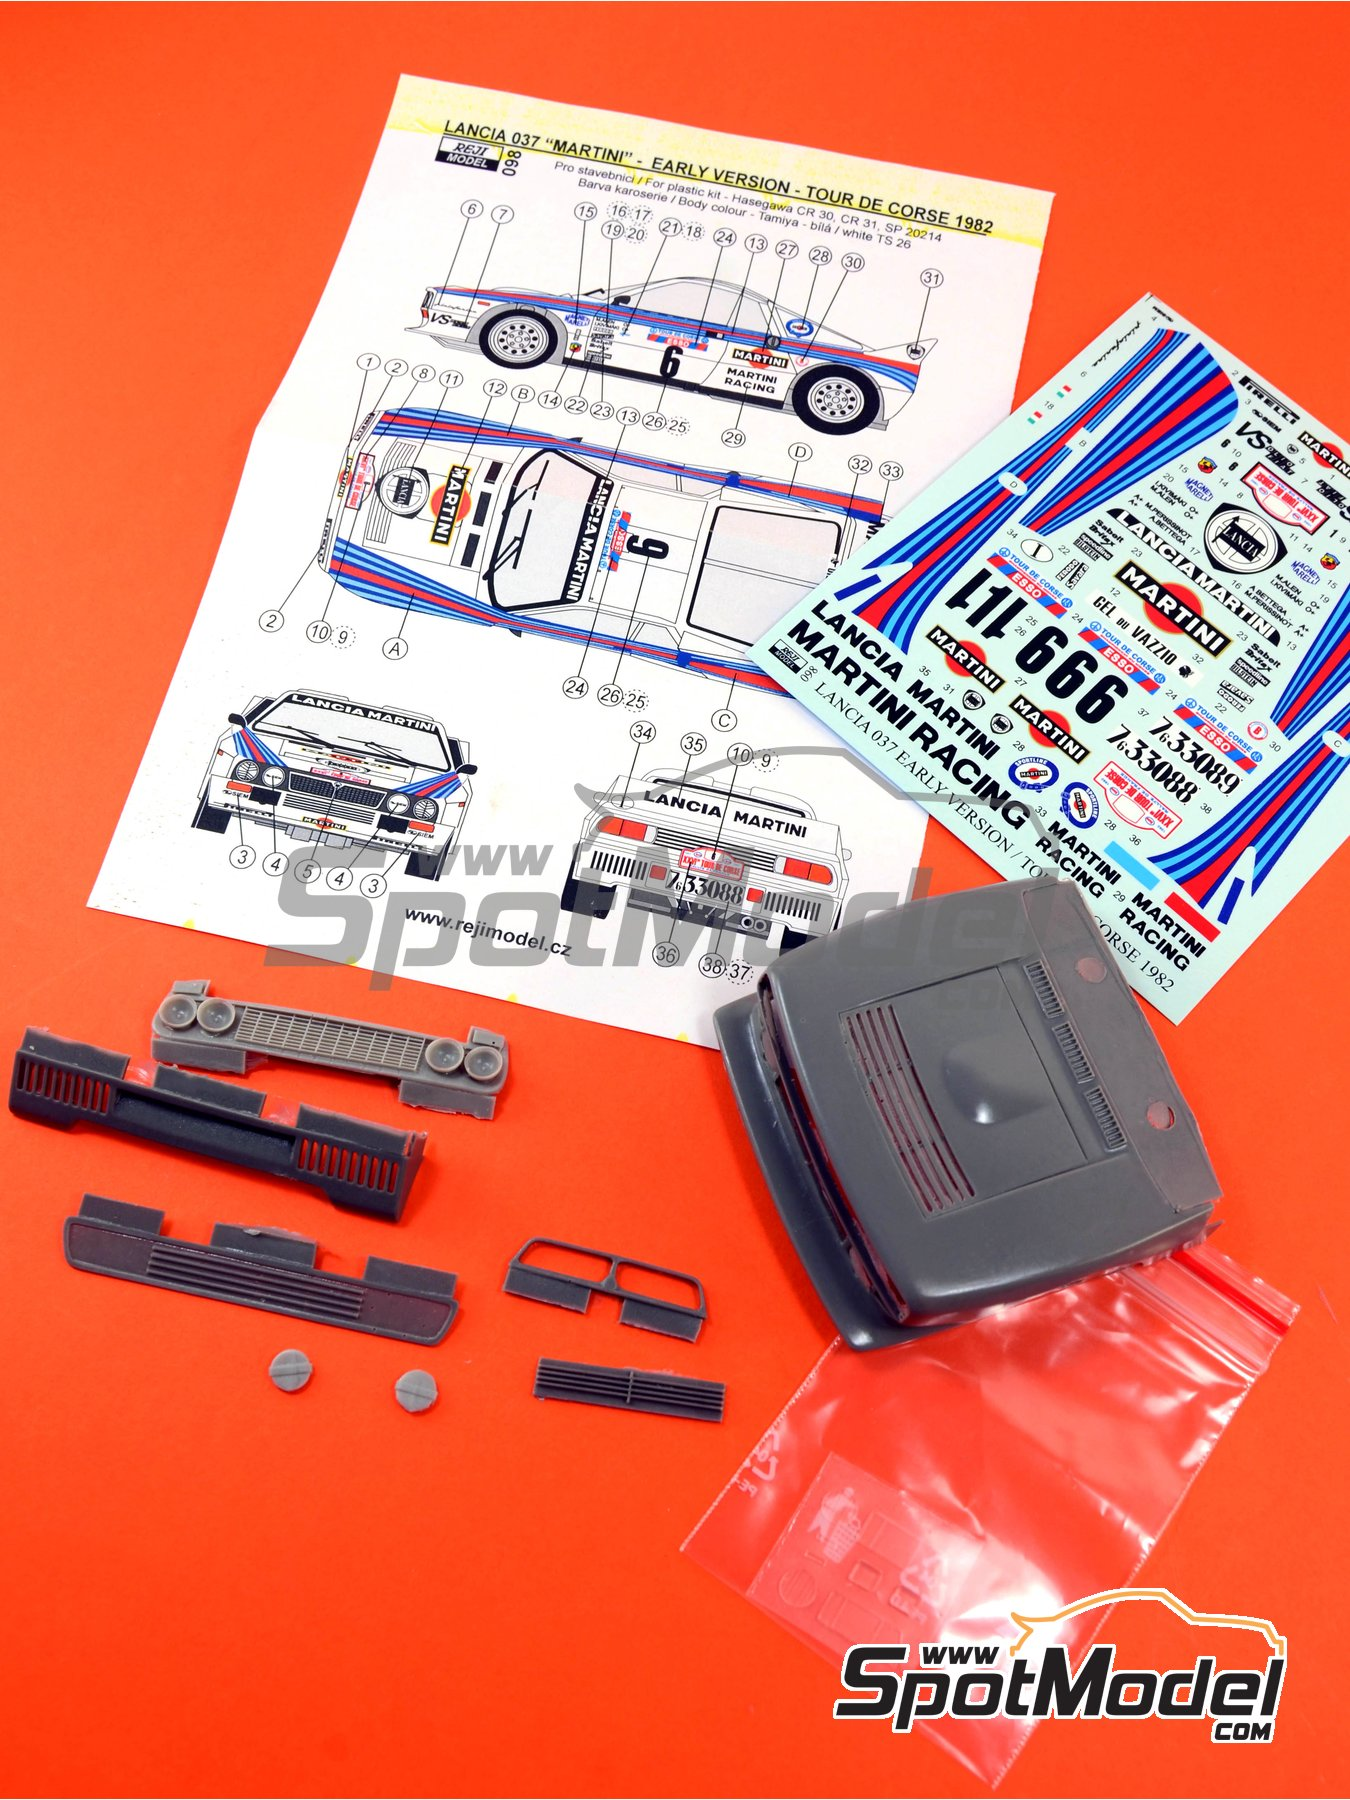 Lancia 037 Rally Martini - Rally Tour de Corse 1982 | Transkit en escala1/24 fabricado por Reji Model (ref.REJI-098) image